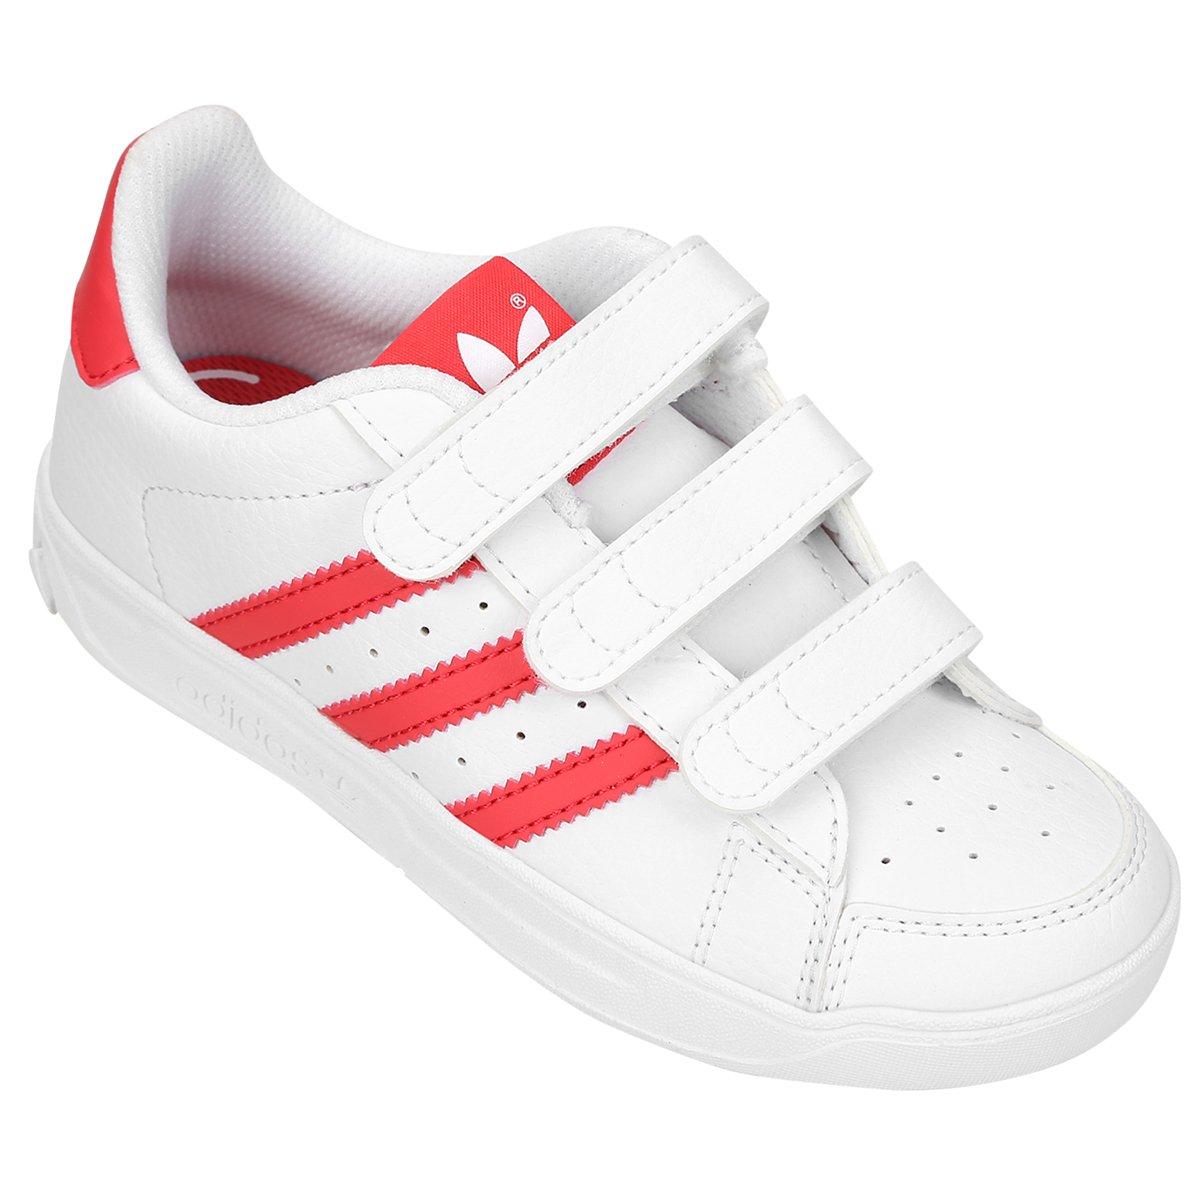 beaaf1c2c4b Tênis Adidas Alumno Cf K Infantil - Compre Agora